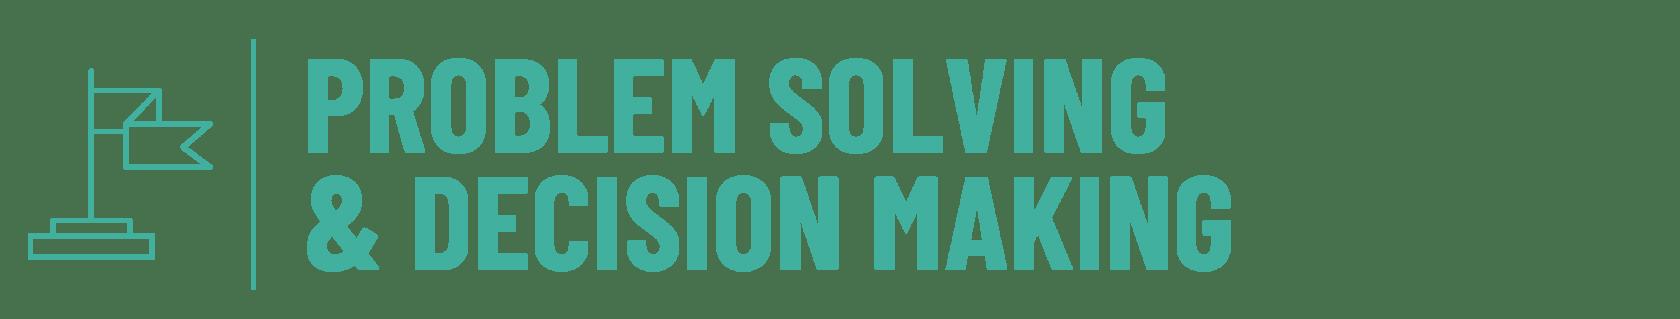 Header_Management_IN-Problem Solving_Tavola disegno 1